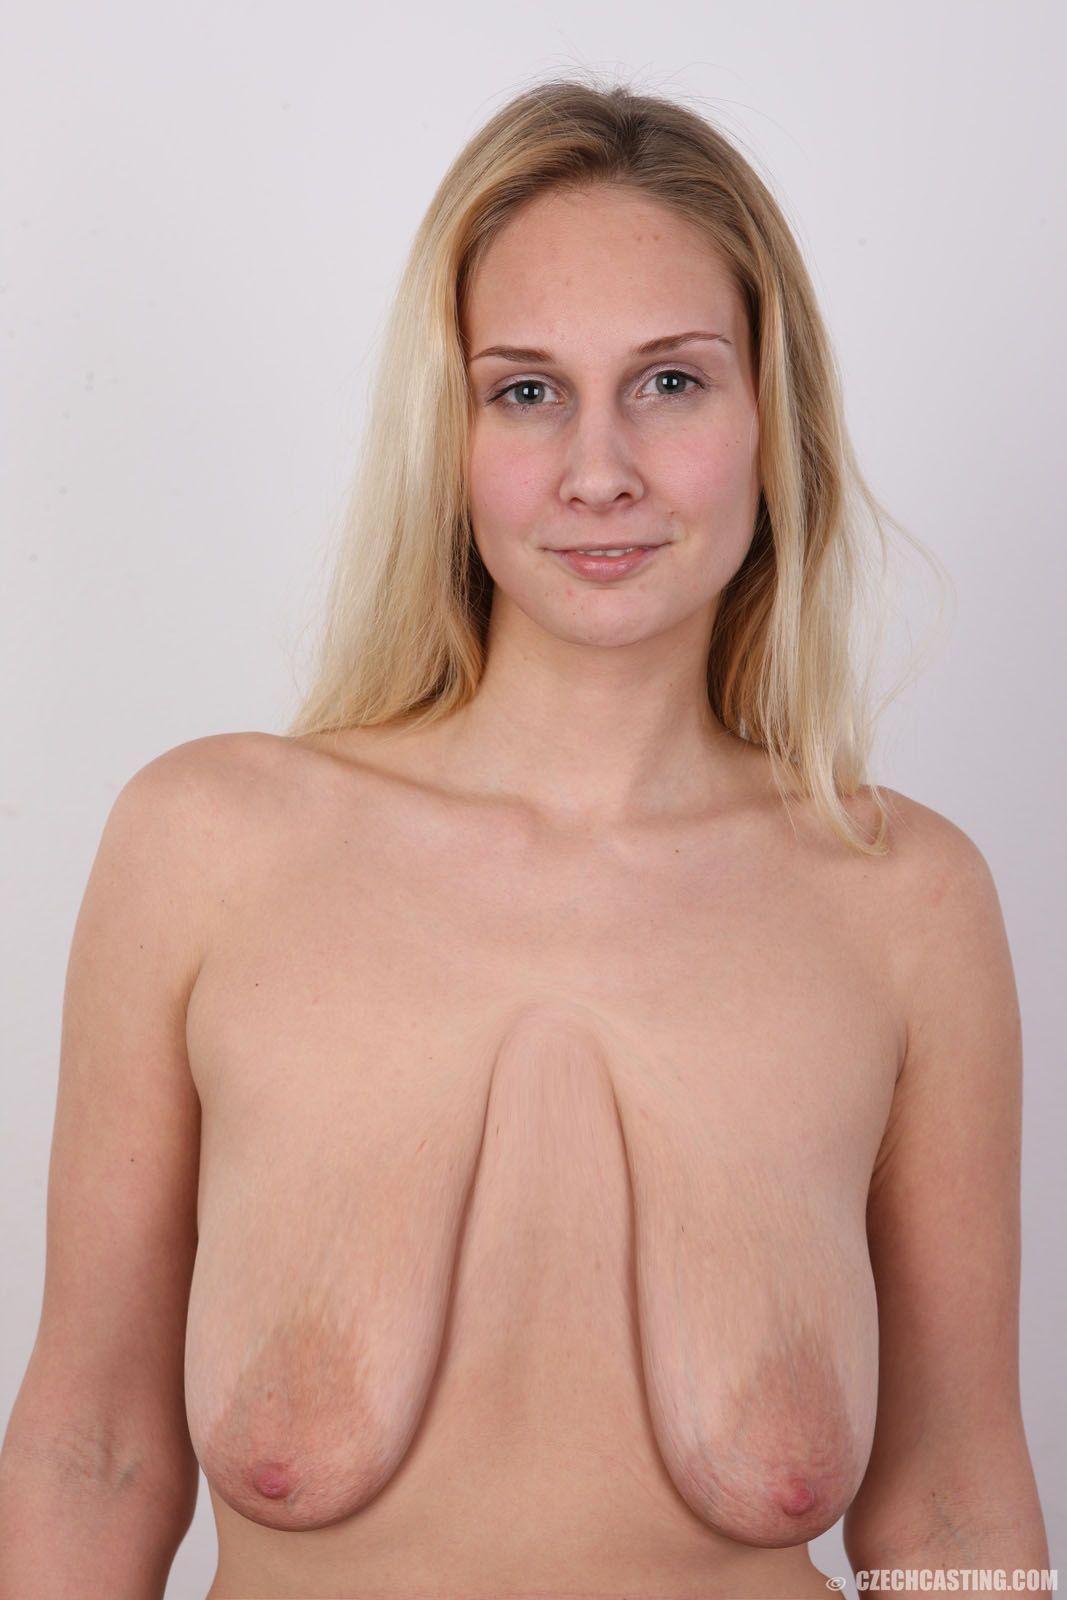 Empty saggy tits timblr